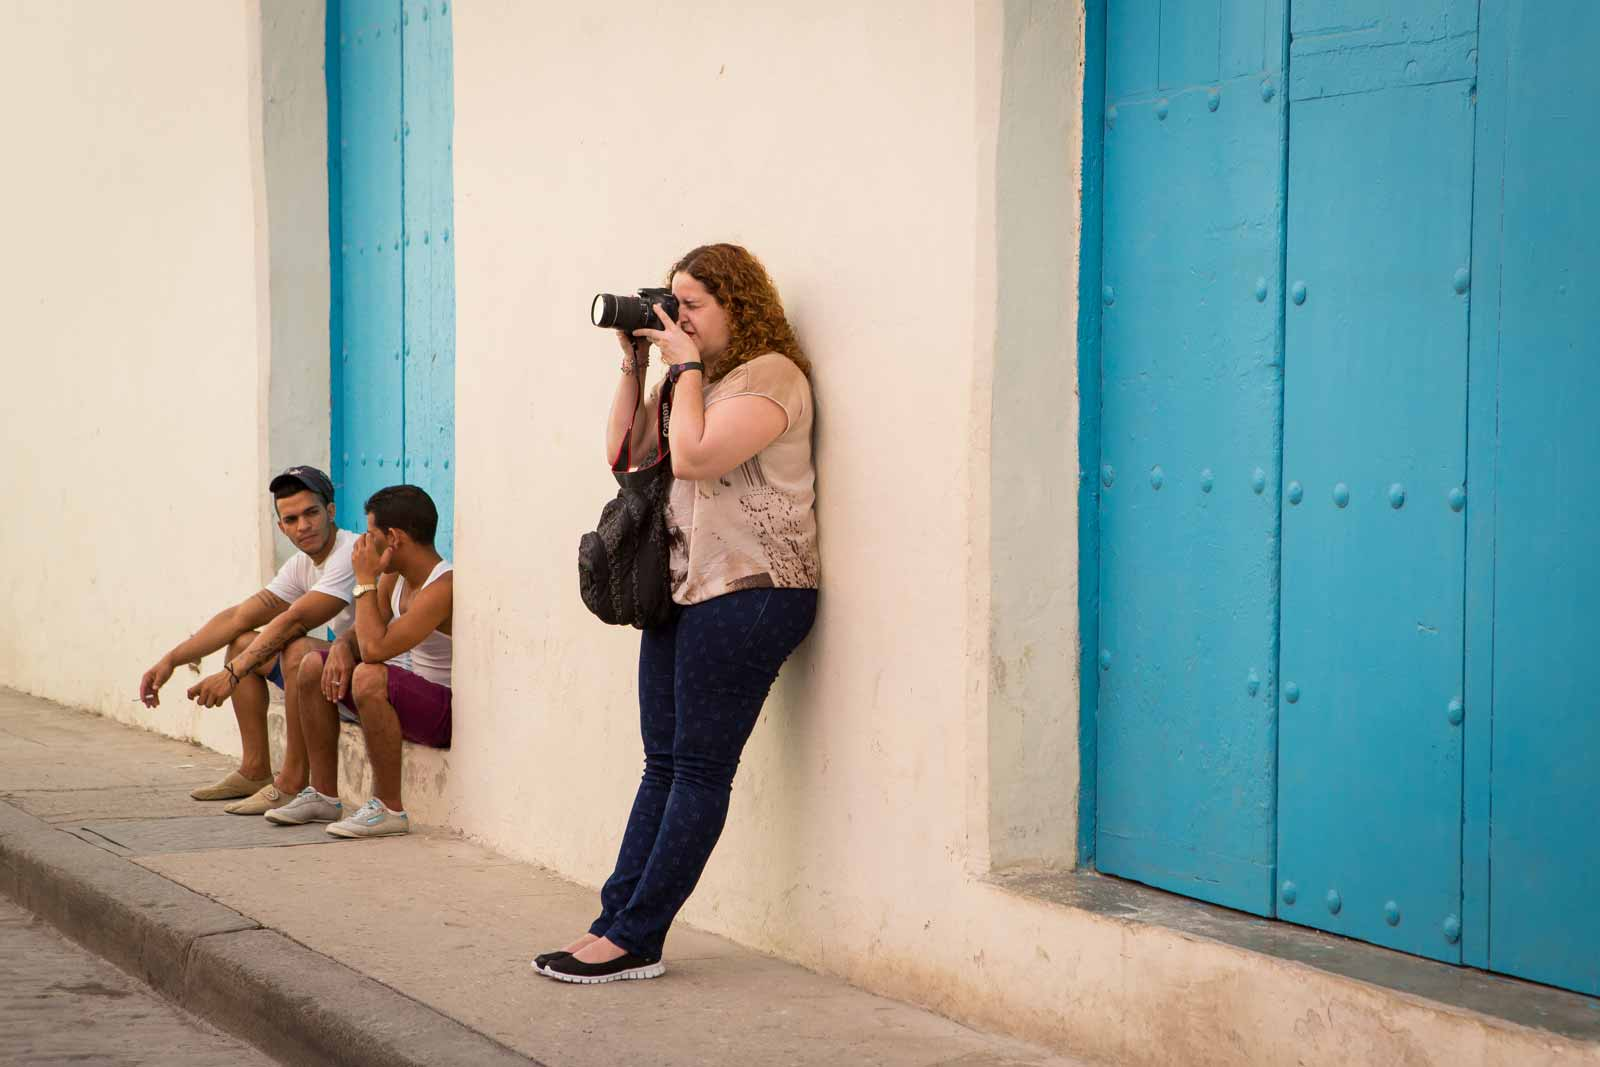 nationalgeographic-cuba-foto-tour